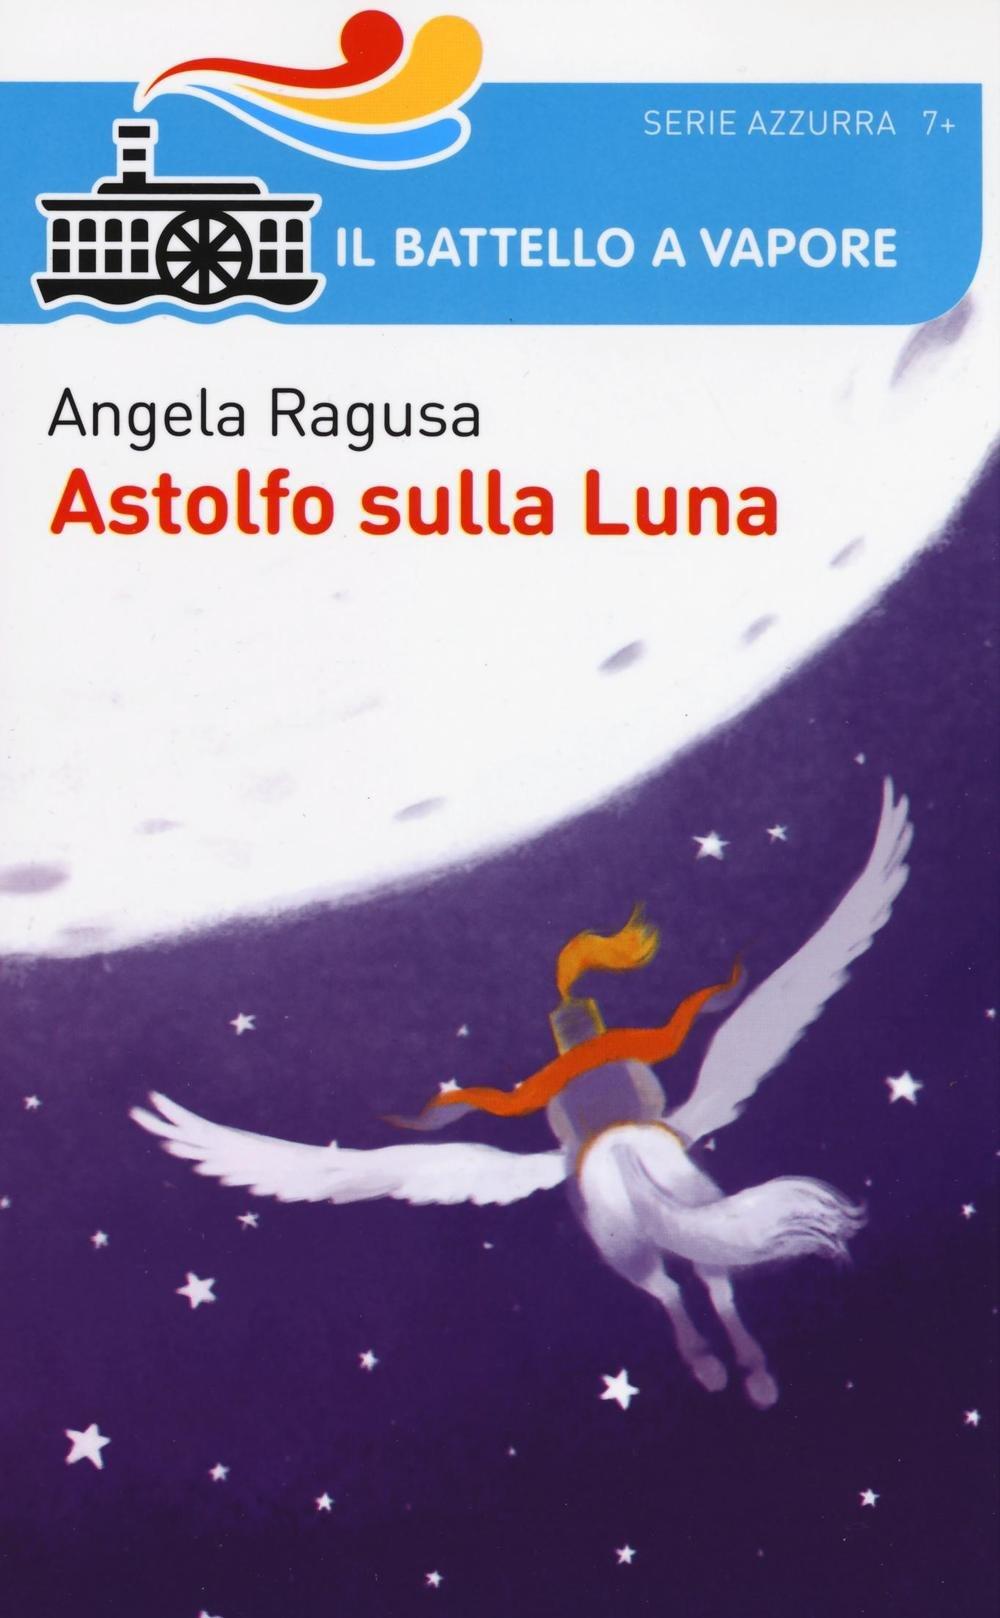 RagusaPD'altan Angela Luna Sulla Amazon Libri itAstolfo Nm08Ovnw